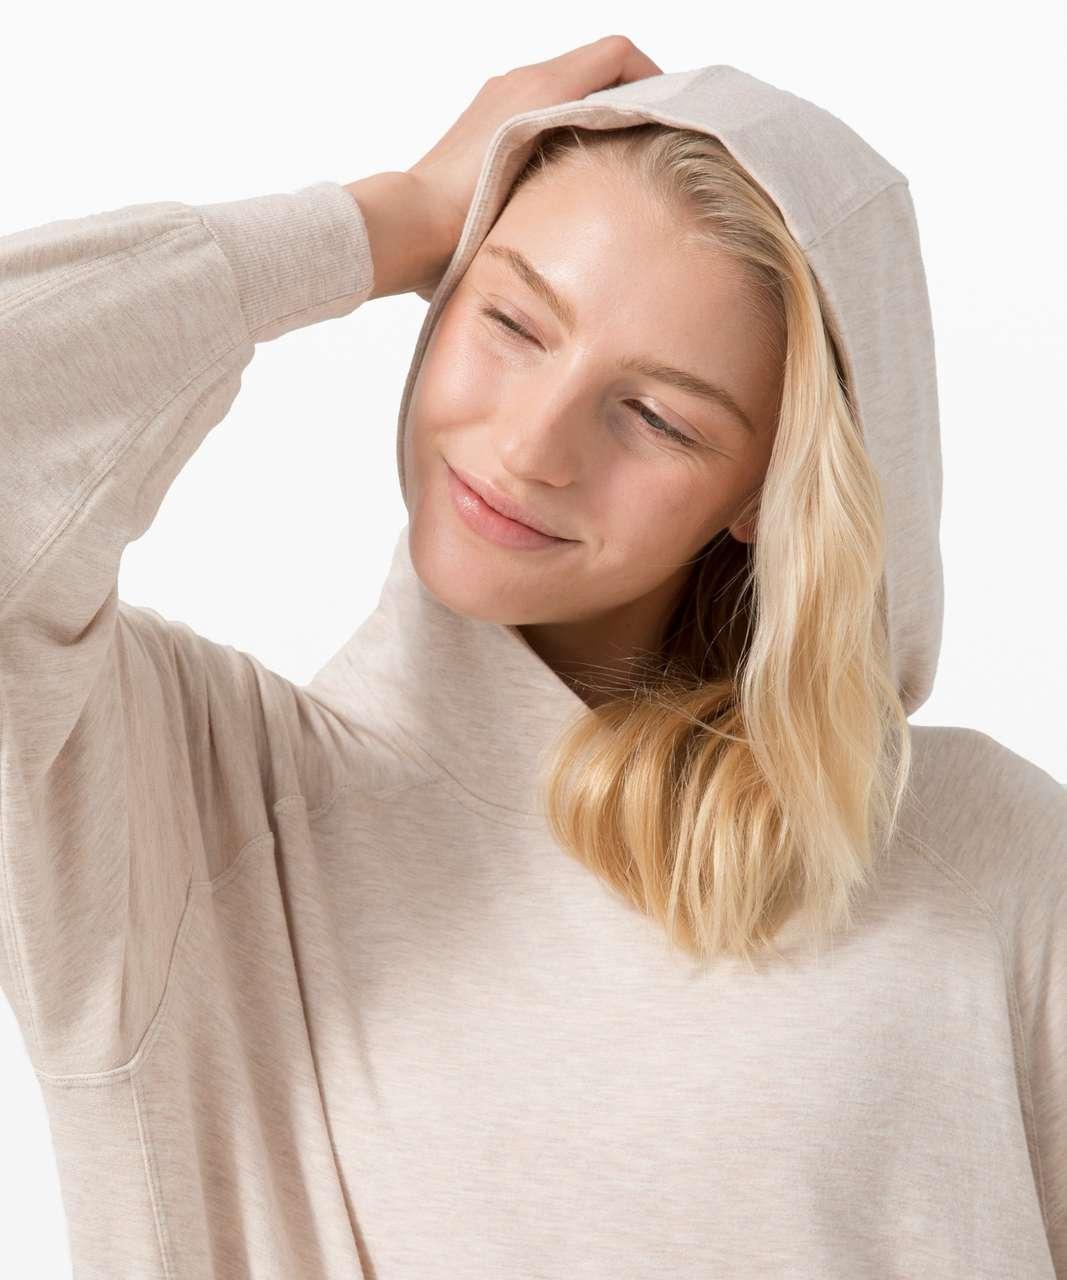 Lululemon Seek Stillness Hoodie - Heathered Cashew